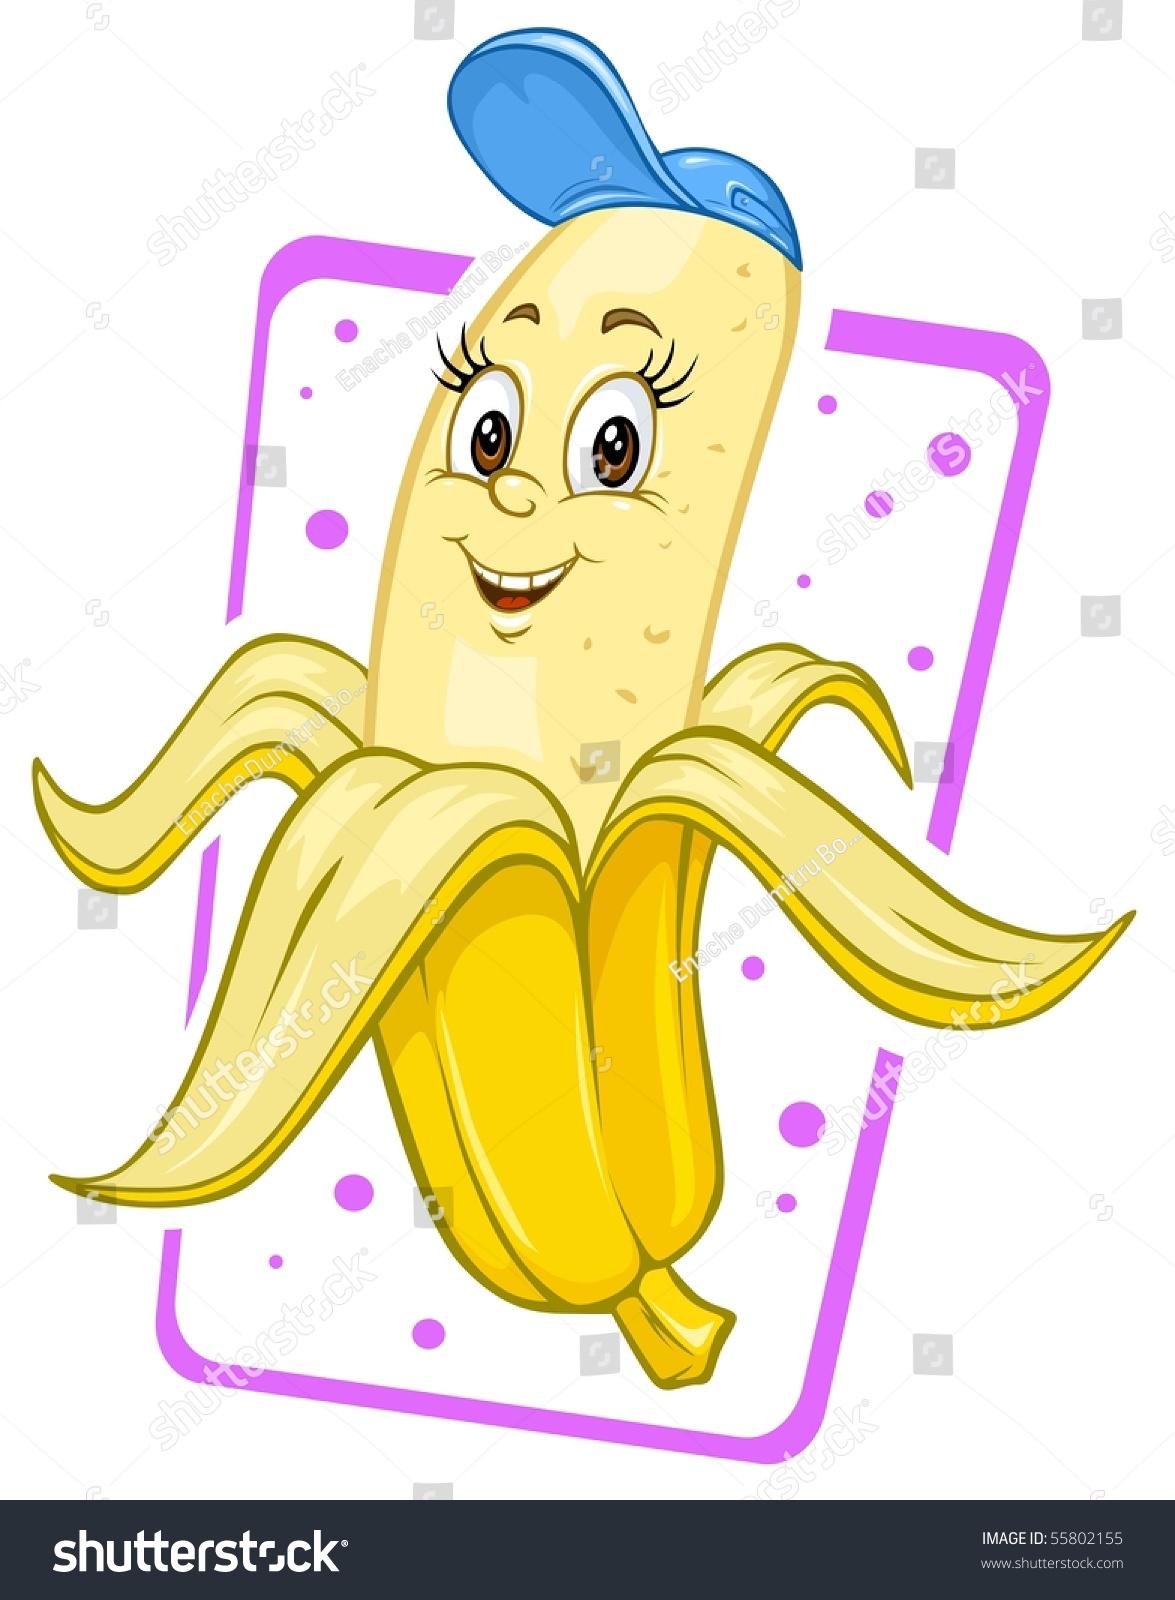 Cartoon Banana Clip Art Illustration Stock Vector (Royalty Free ...